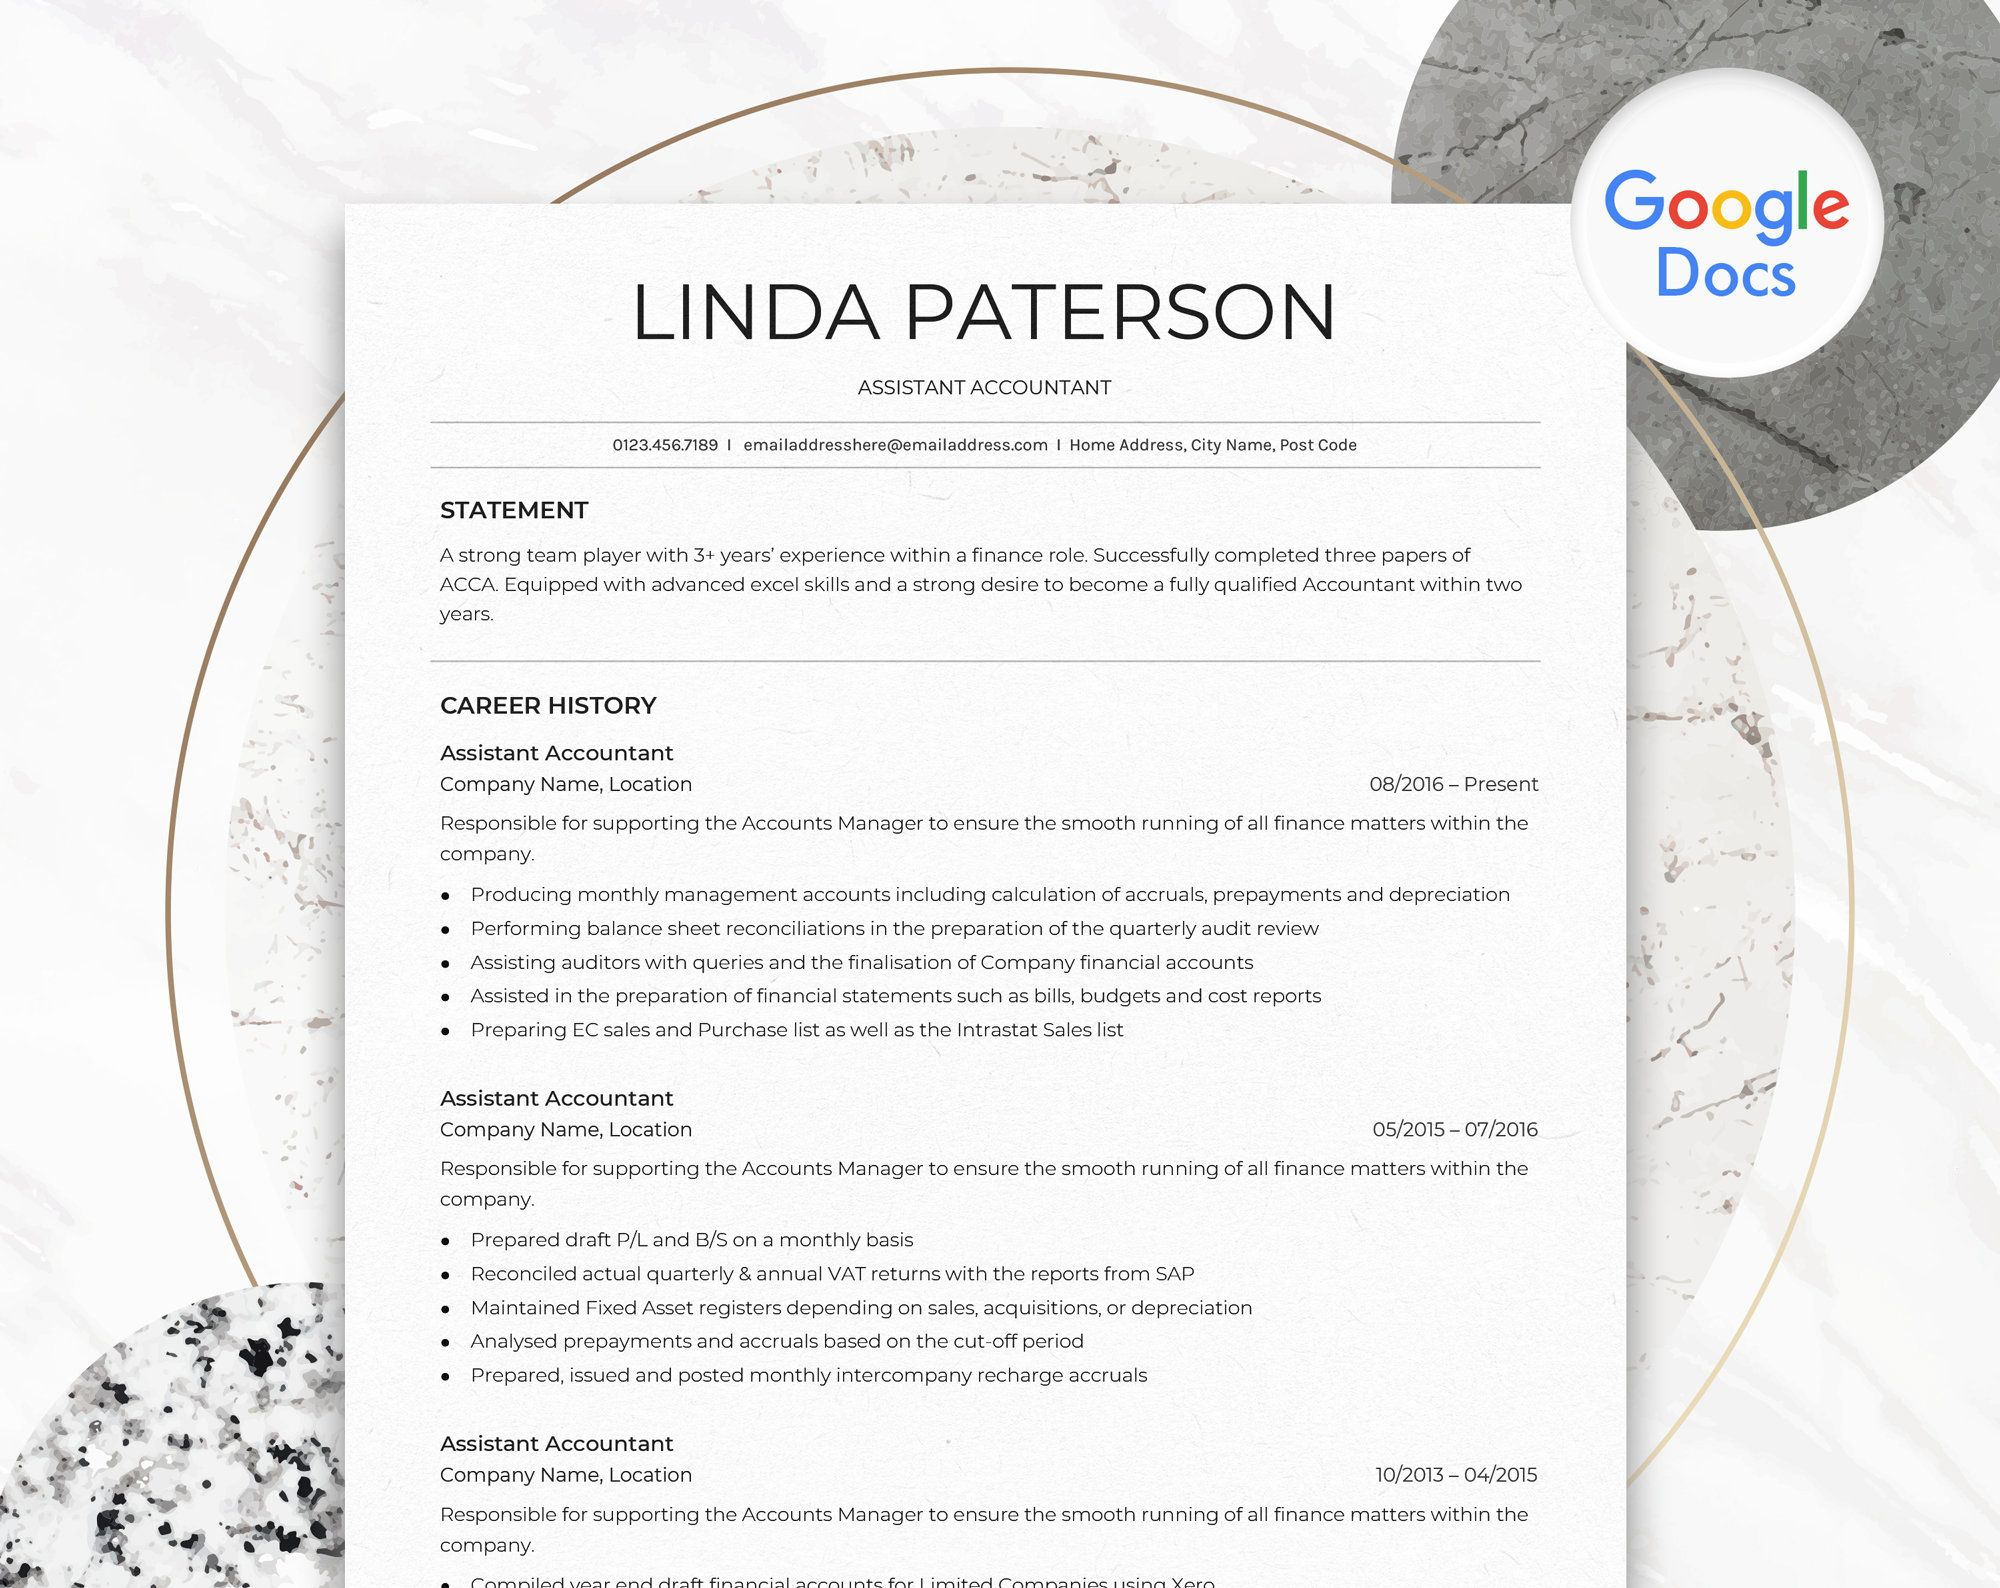 Google Docs Resume Template Professional Resume For Google Docs Minimalist Resume Design Simple Simple Resume Template Resume Template Etsy Resume Template